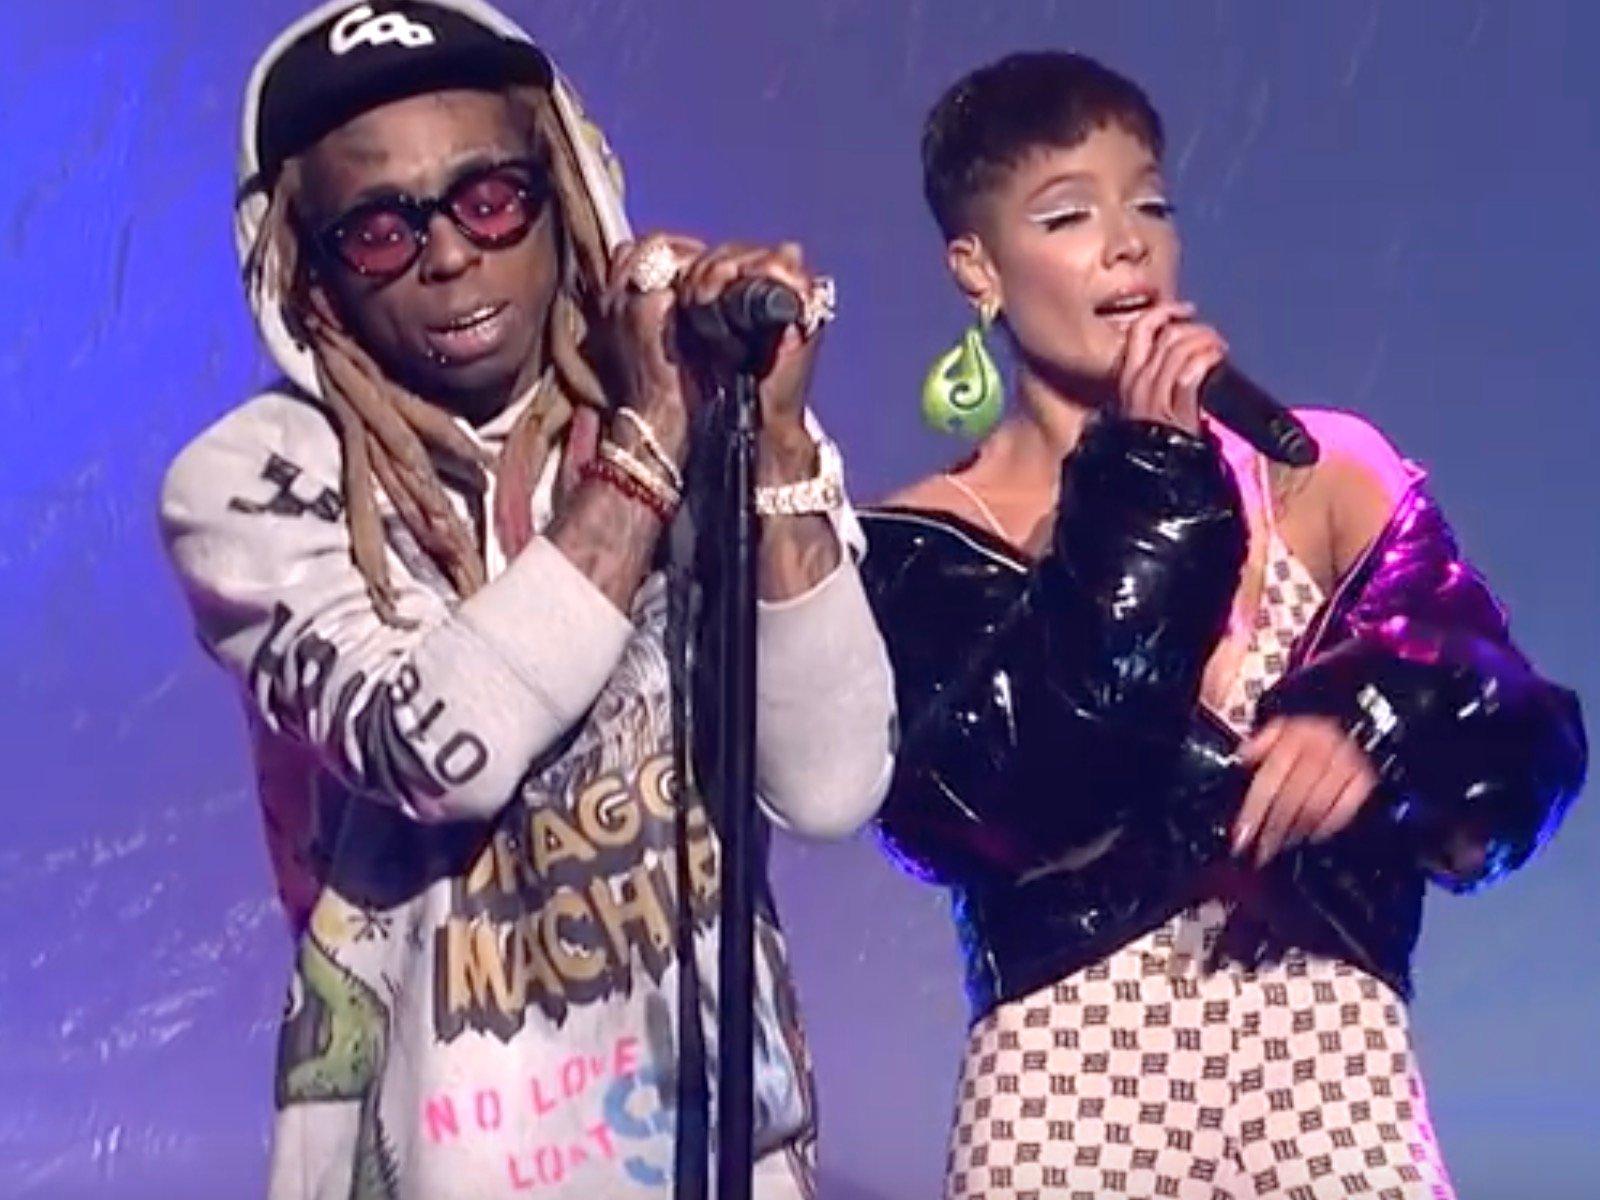 Lil Wayne Halsey